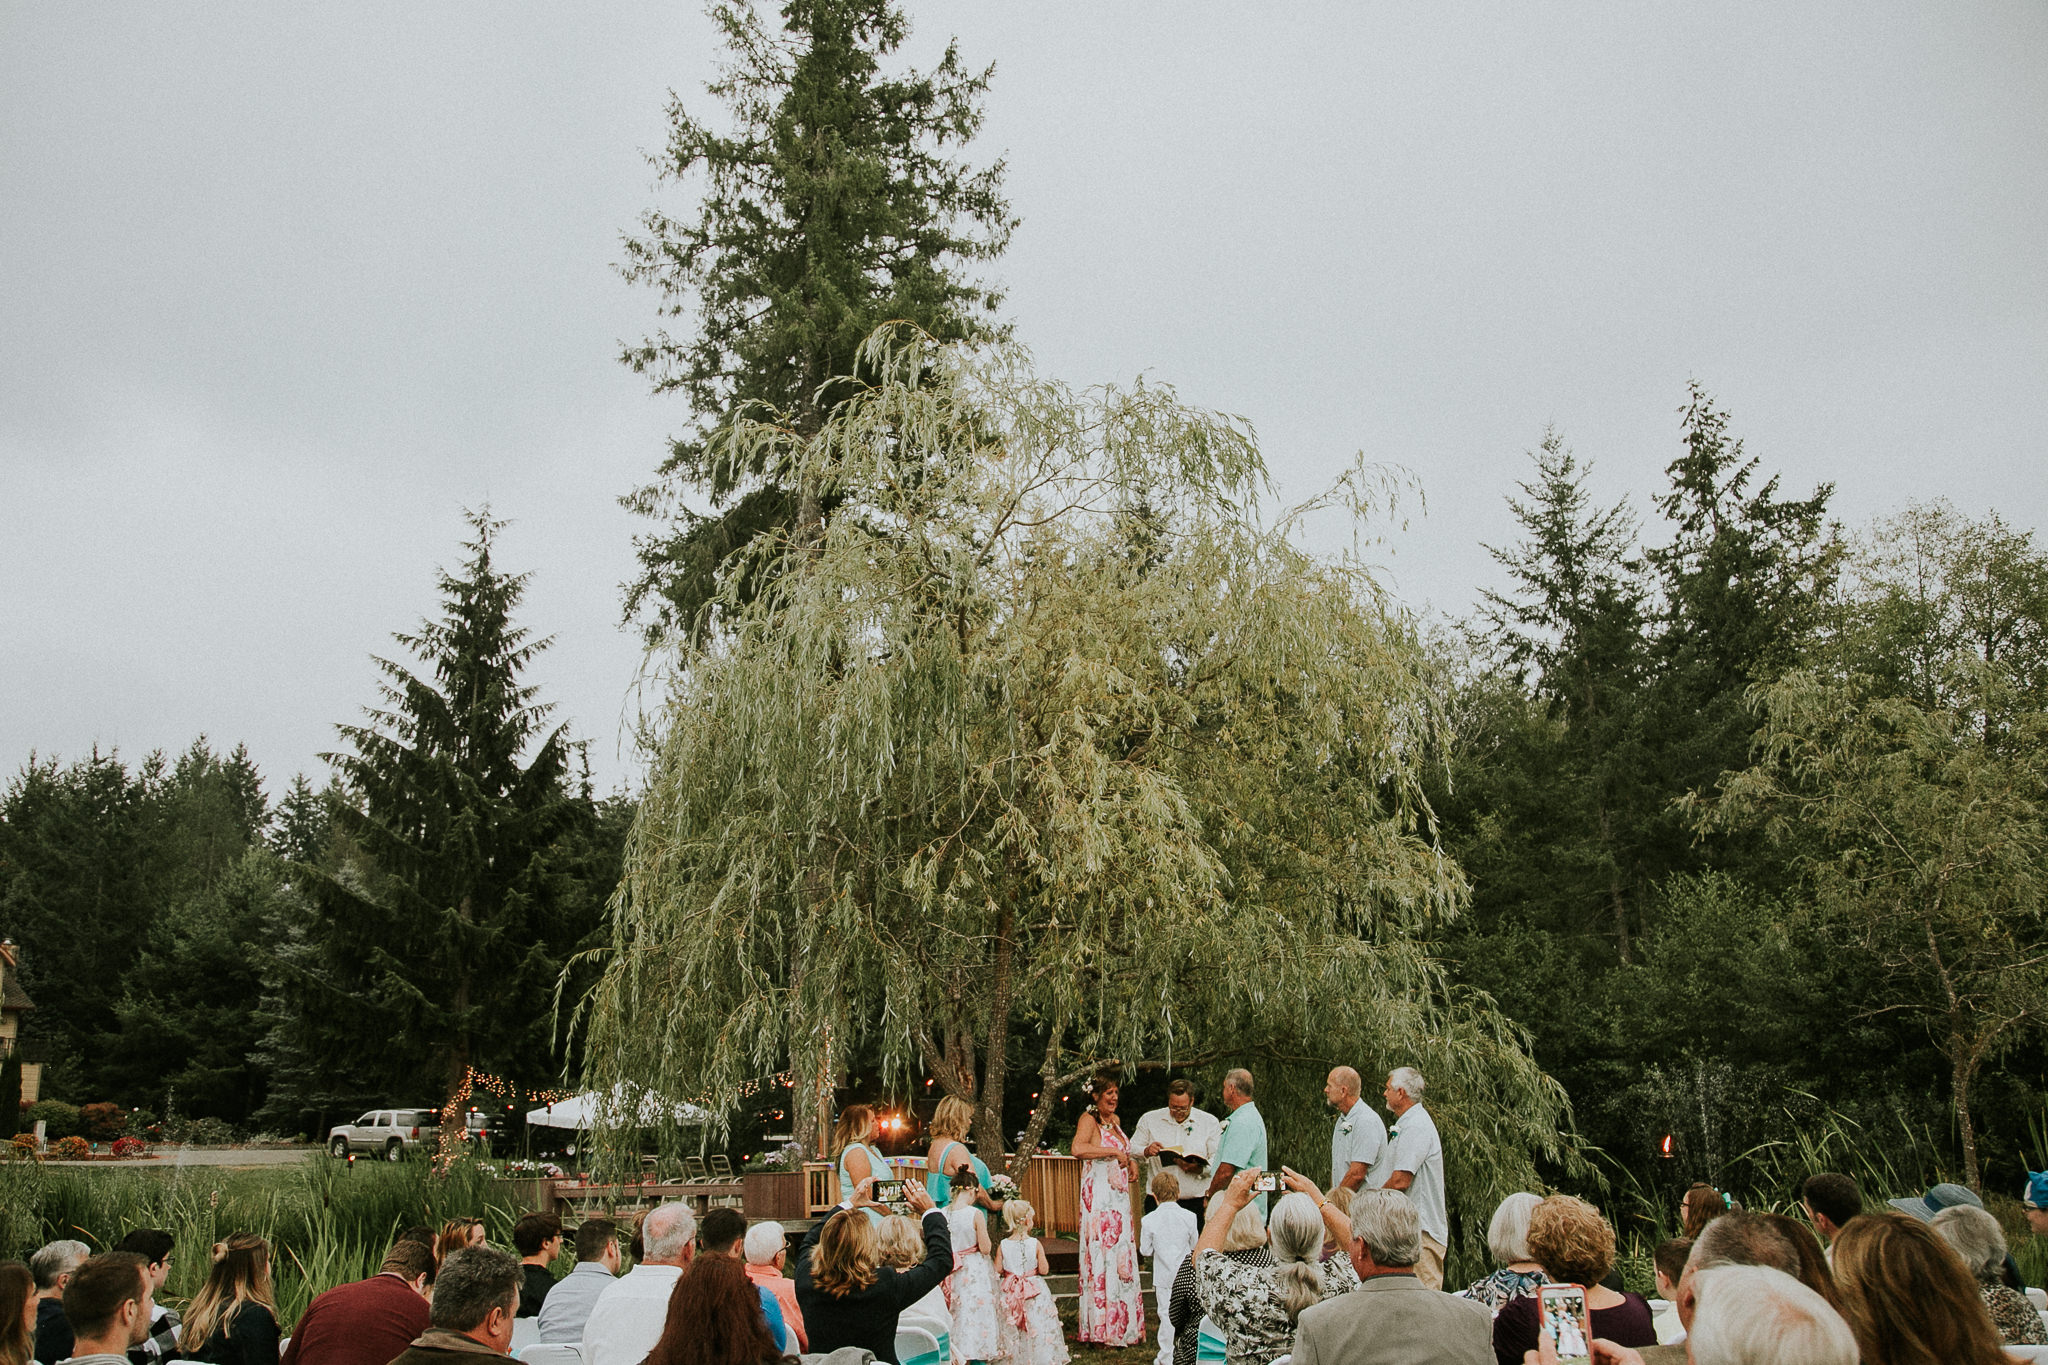 Backyard-Elopement-Ceremony-51.jpg